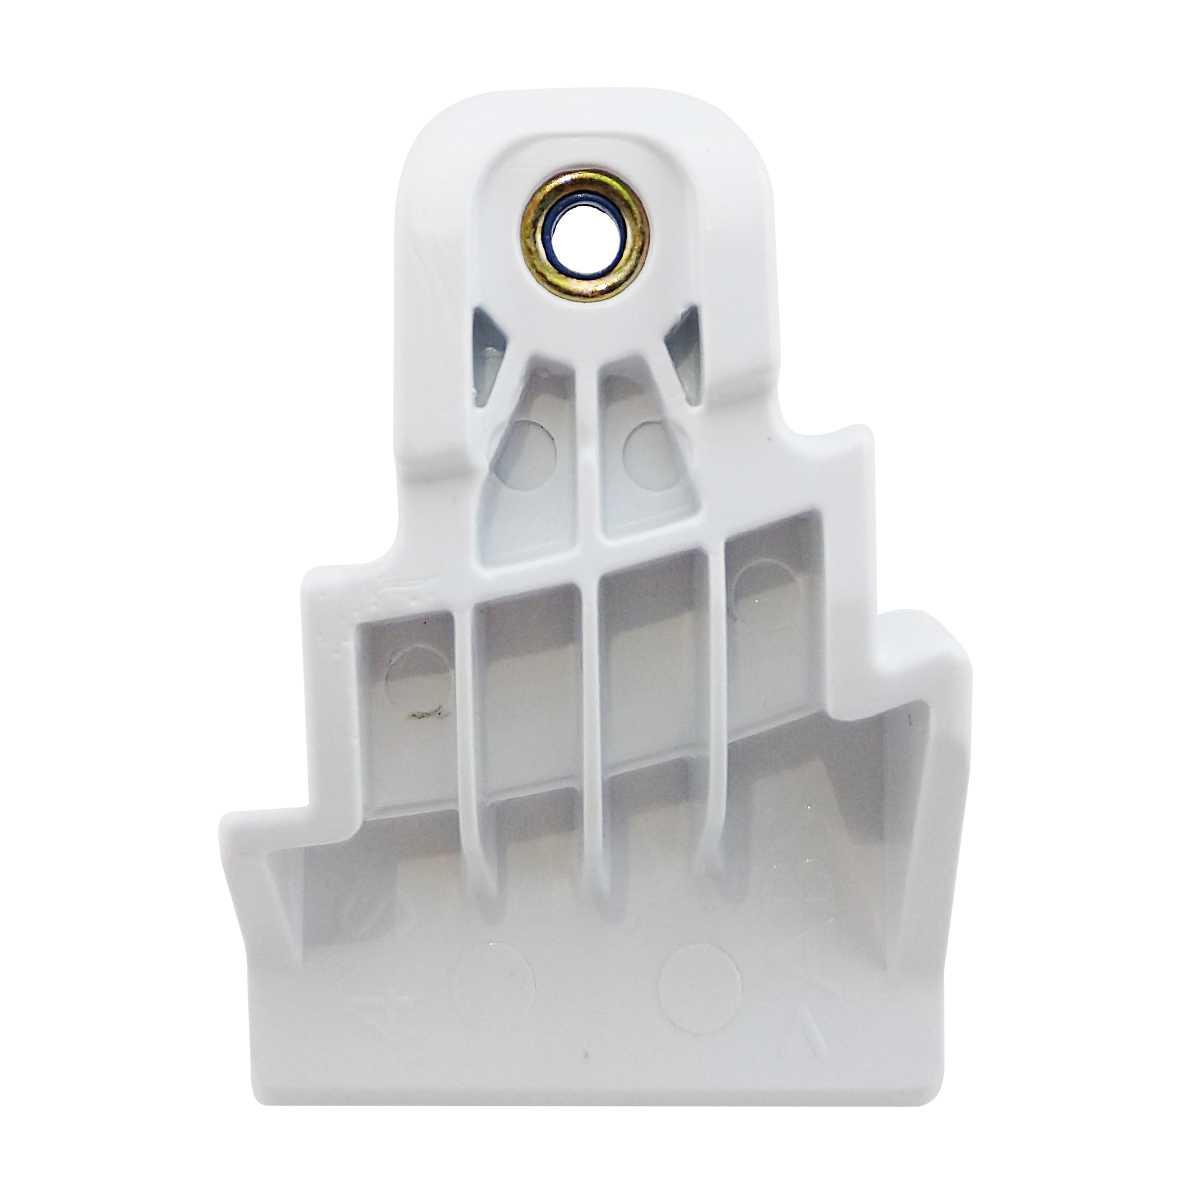 Fixador do puxador da geladeira Electrolux DB53, IB53, TF52, IB52